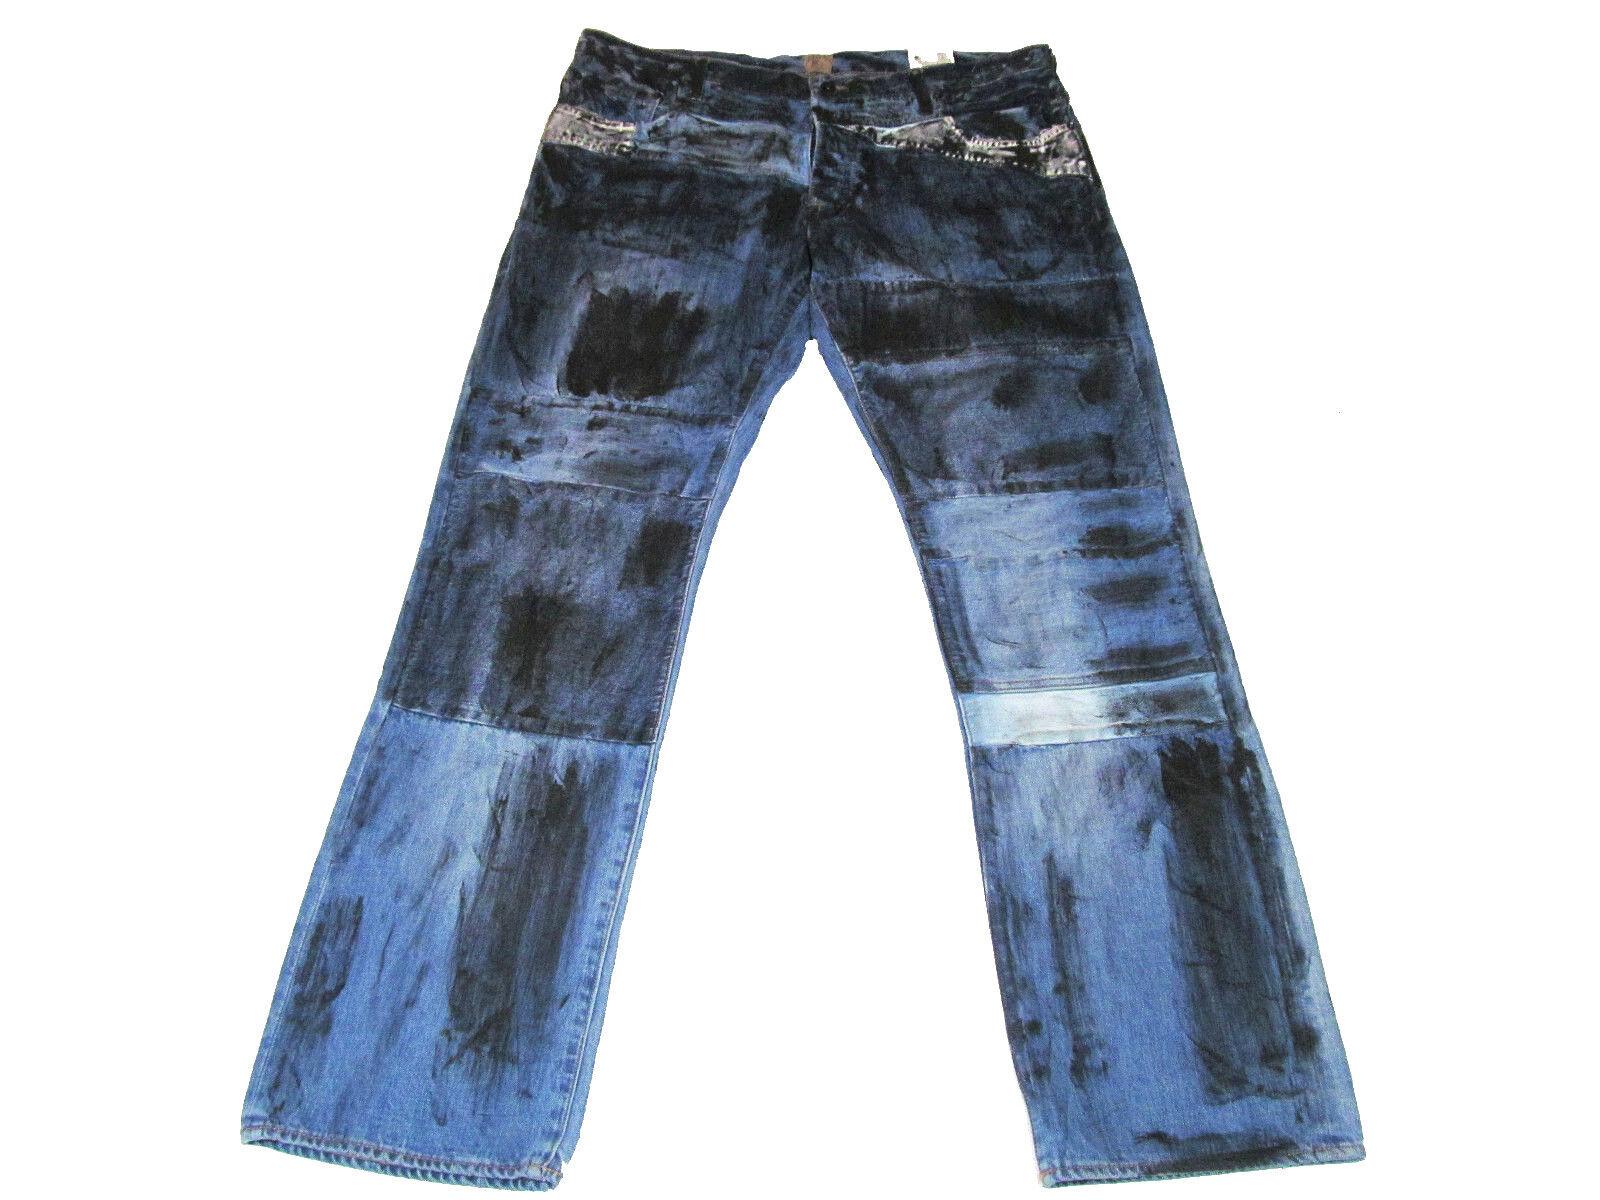 NWT PRPS Goods Mens 32Wx34L Barracuda Equuleus bluee Jeans E73P64X  MSRP